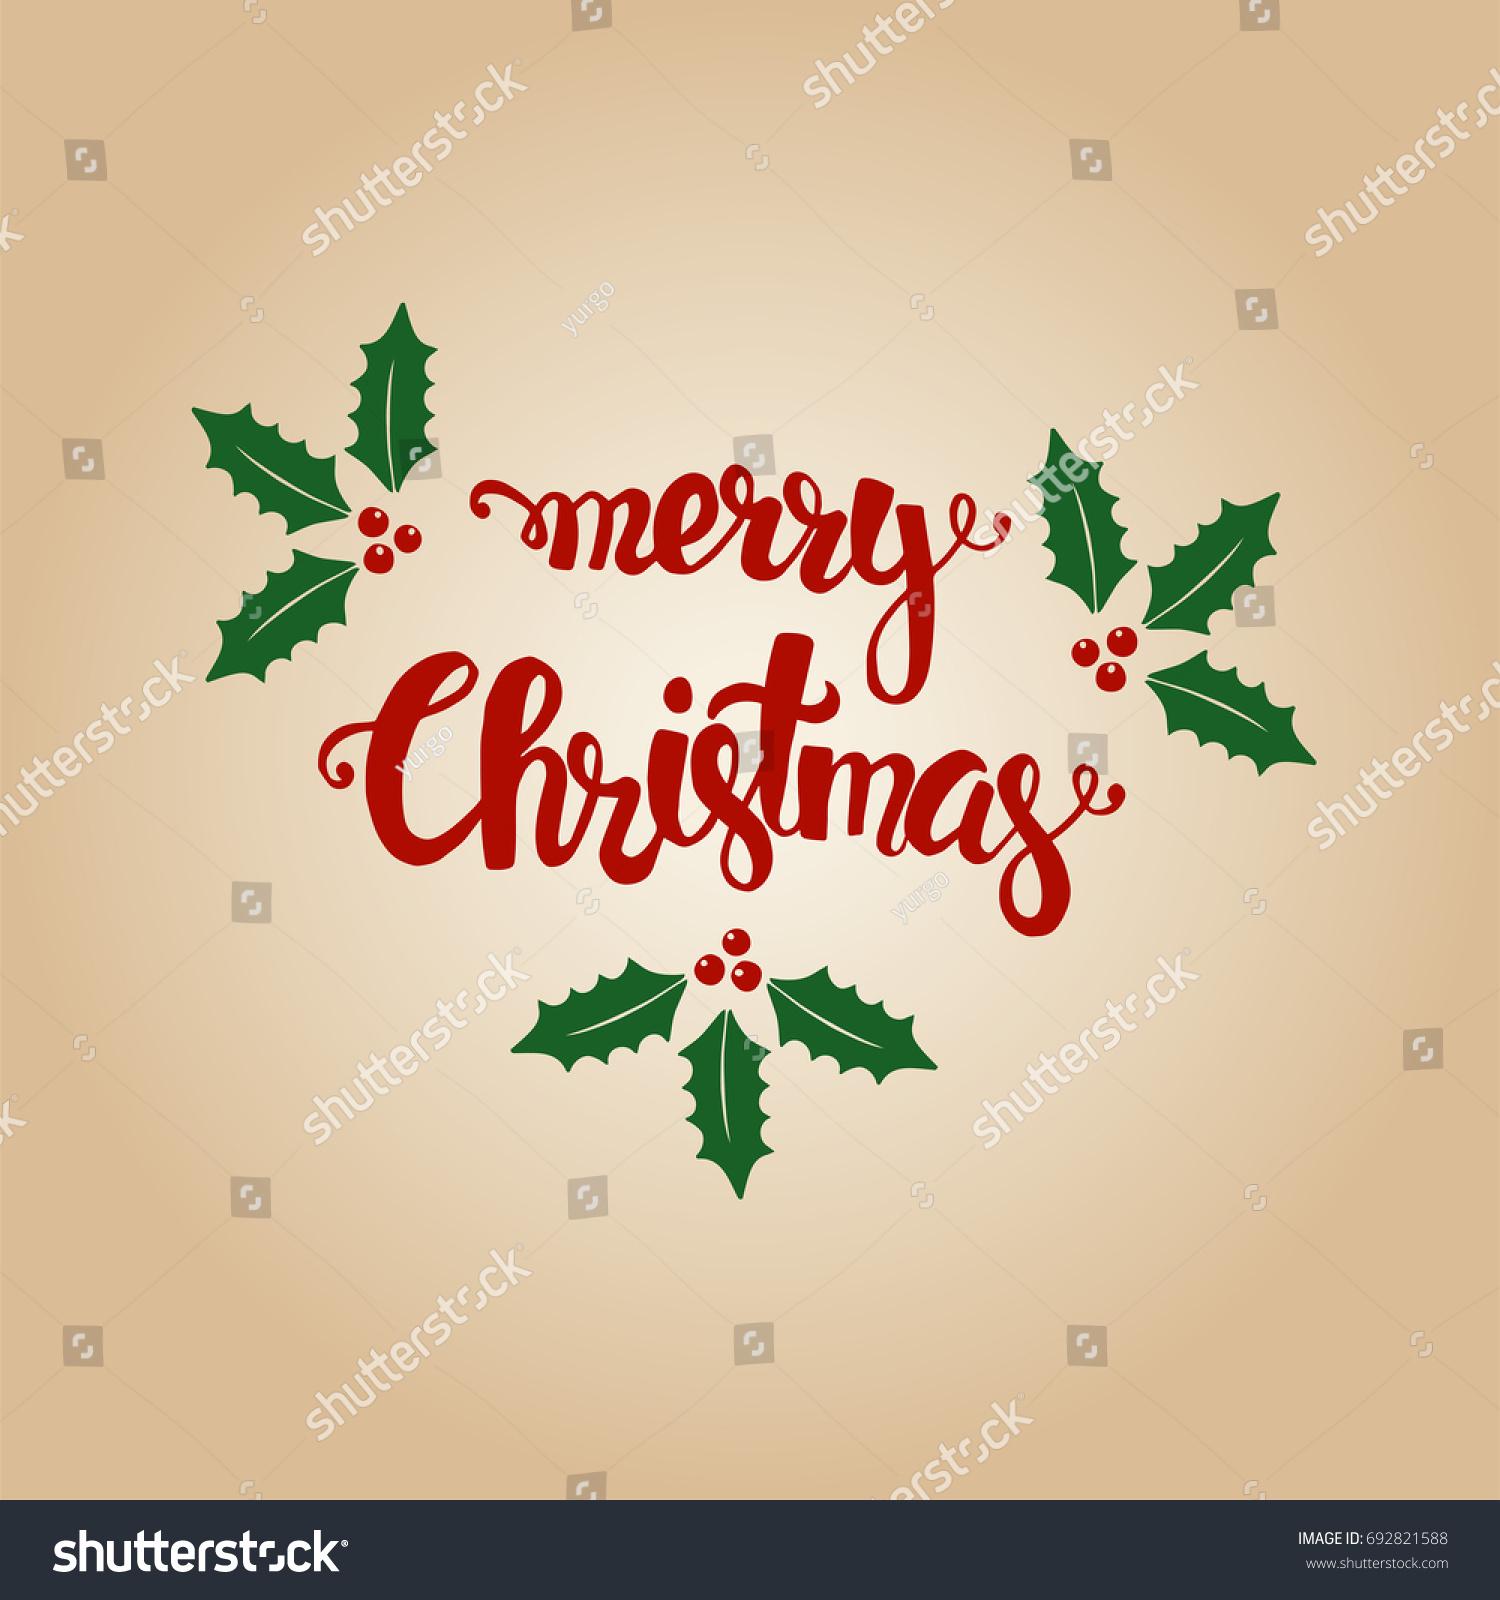 Merry Christmas Hand Drawn Christmas Greeting Stock Vector (Royalty ...